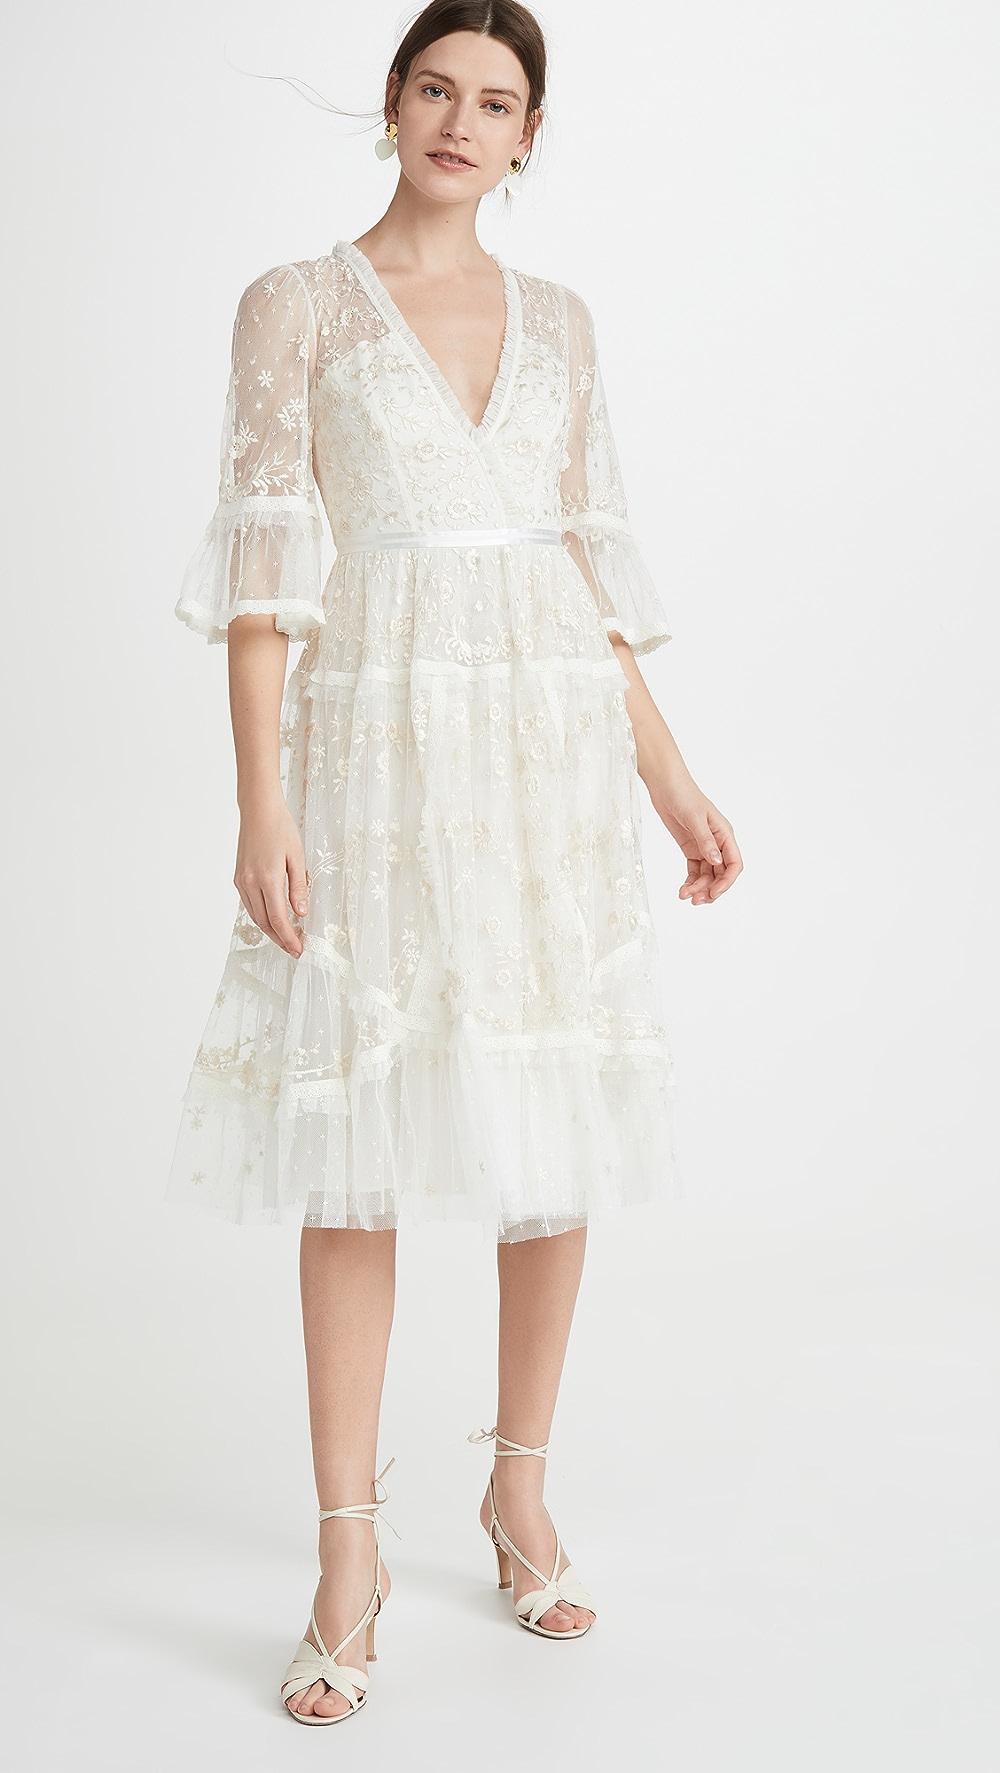 Initiative Needle & Thread - Pennyflower Dress Fragrant Aroma